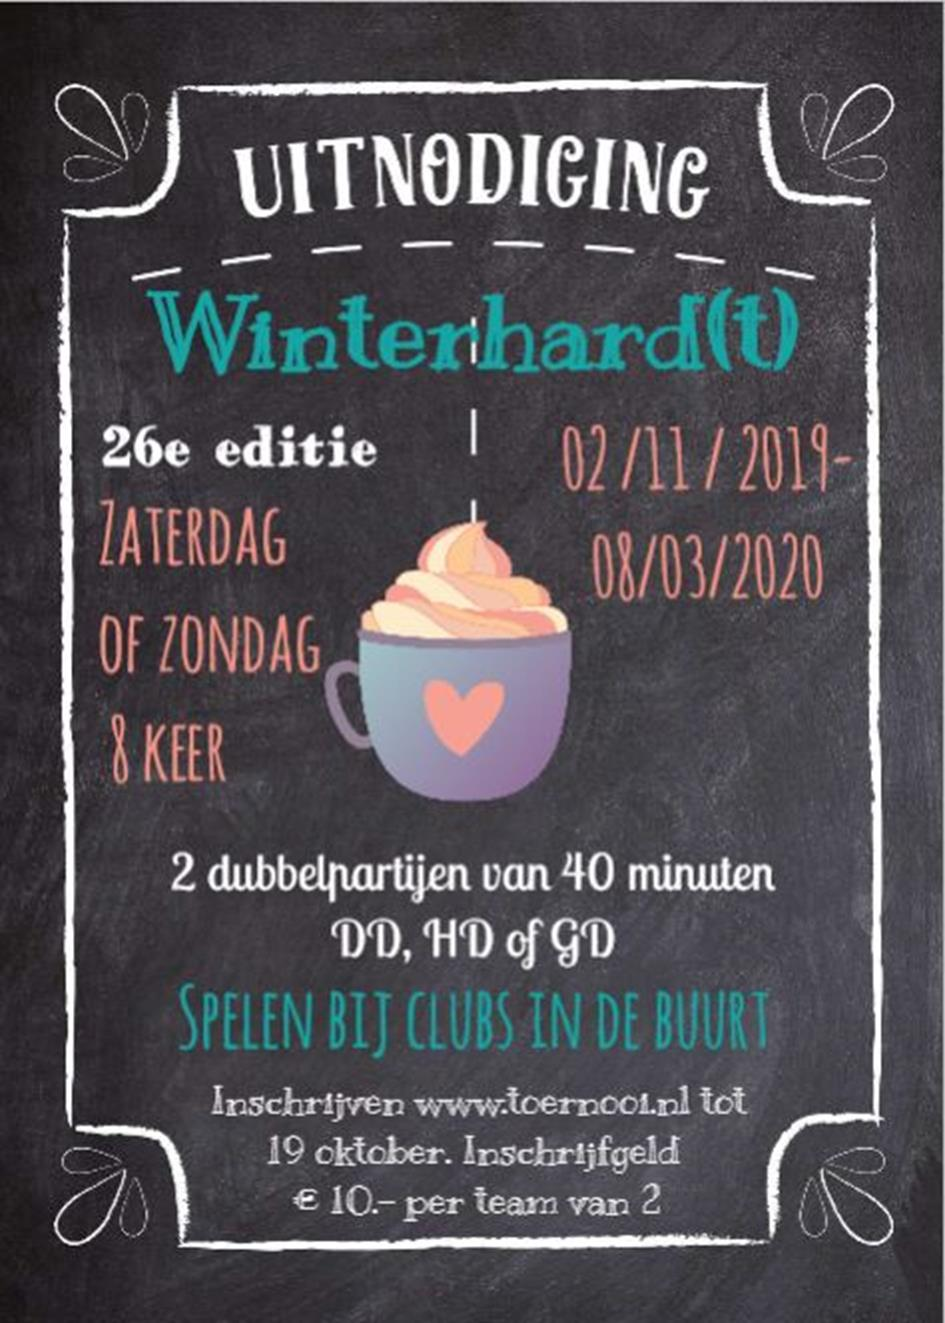 190919 Poster Winterhard(t) 1.JPG